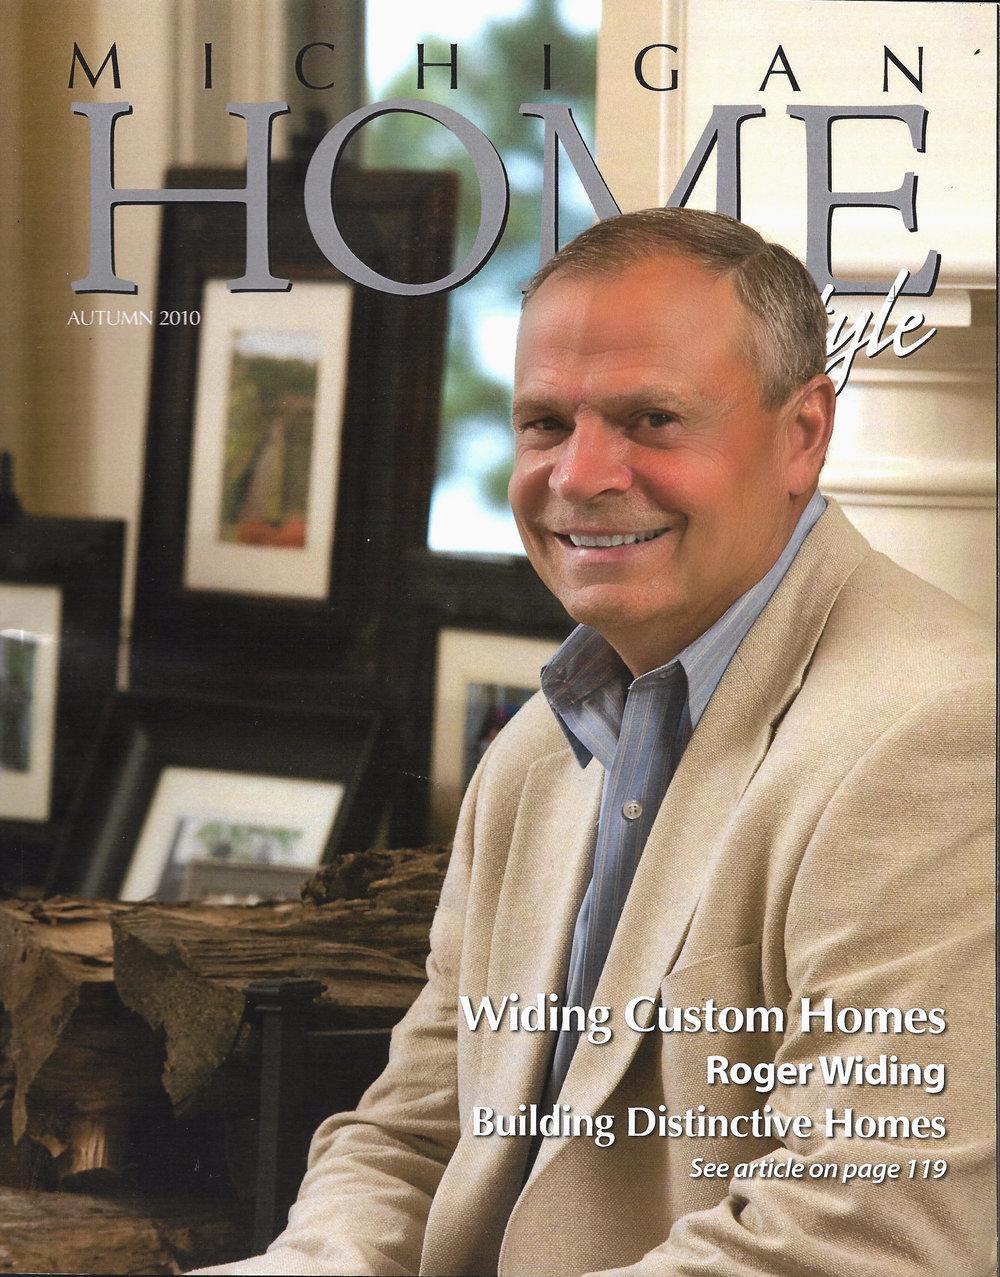 O'Toole, E. B. (2010, Autumn). The Perfect Getaway.  Michigan Home and Lifestyle , 117-124.